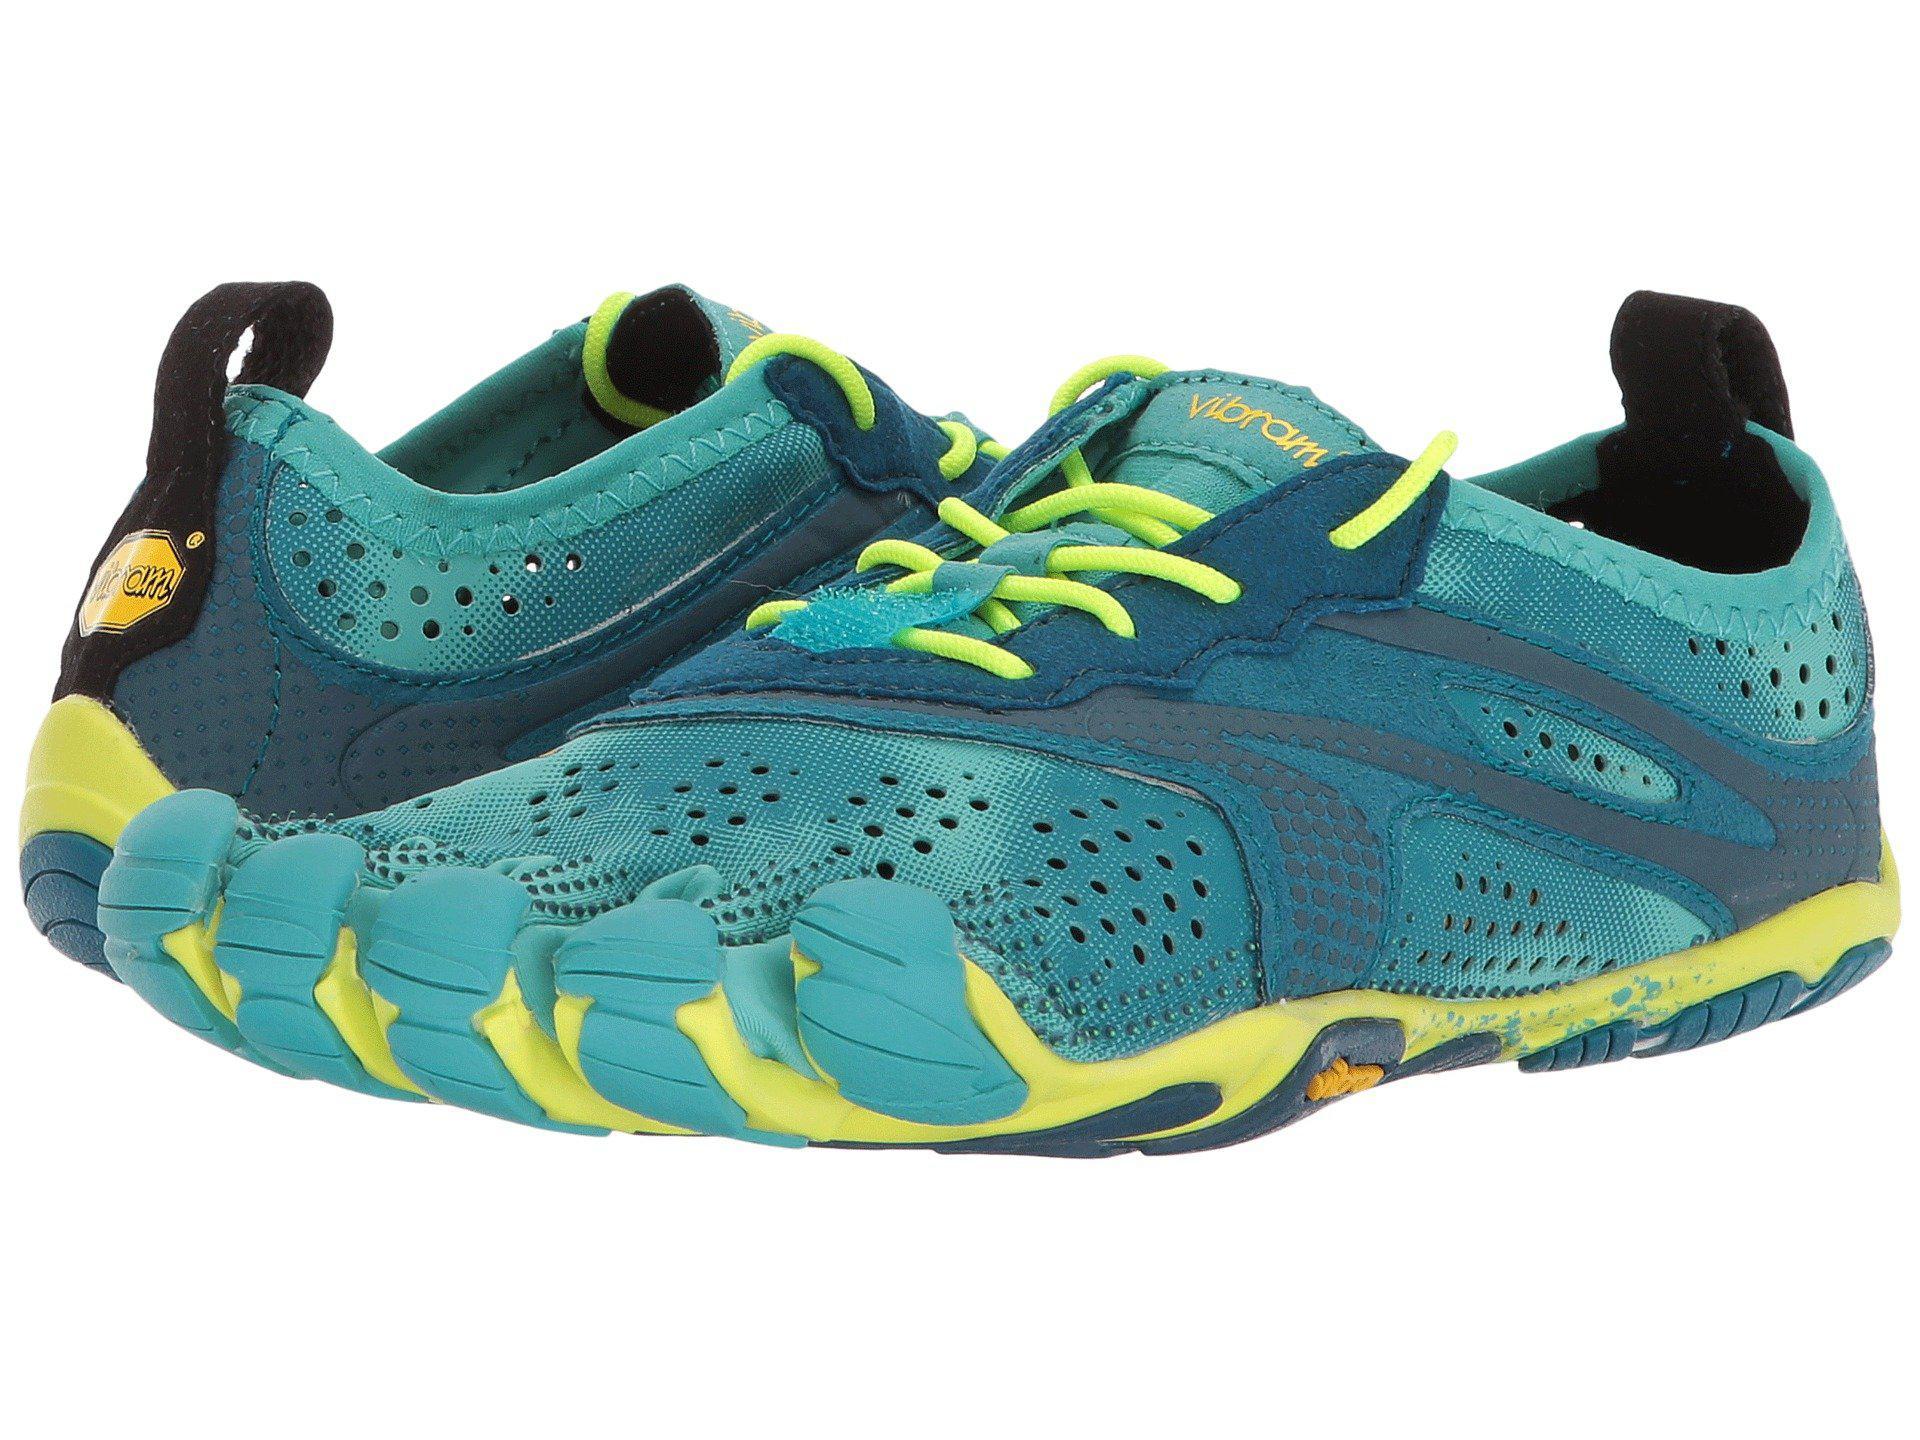 new arrival 519da 68678 Vibram Fivefingers V-run (teal navy) Women s Shoes in Blue - Lyst